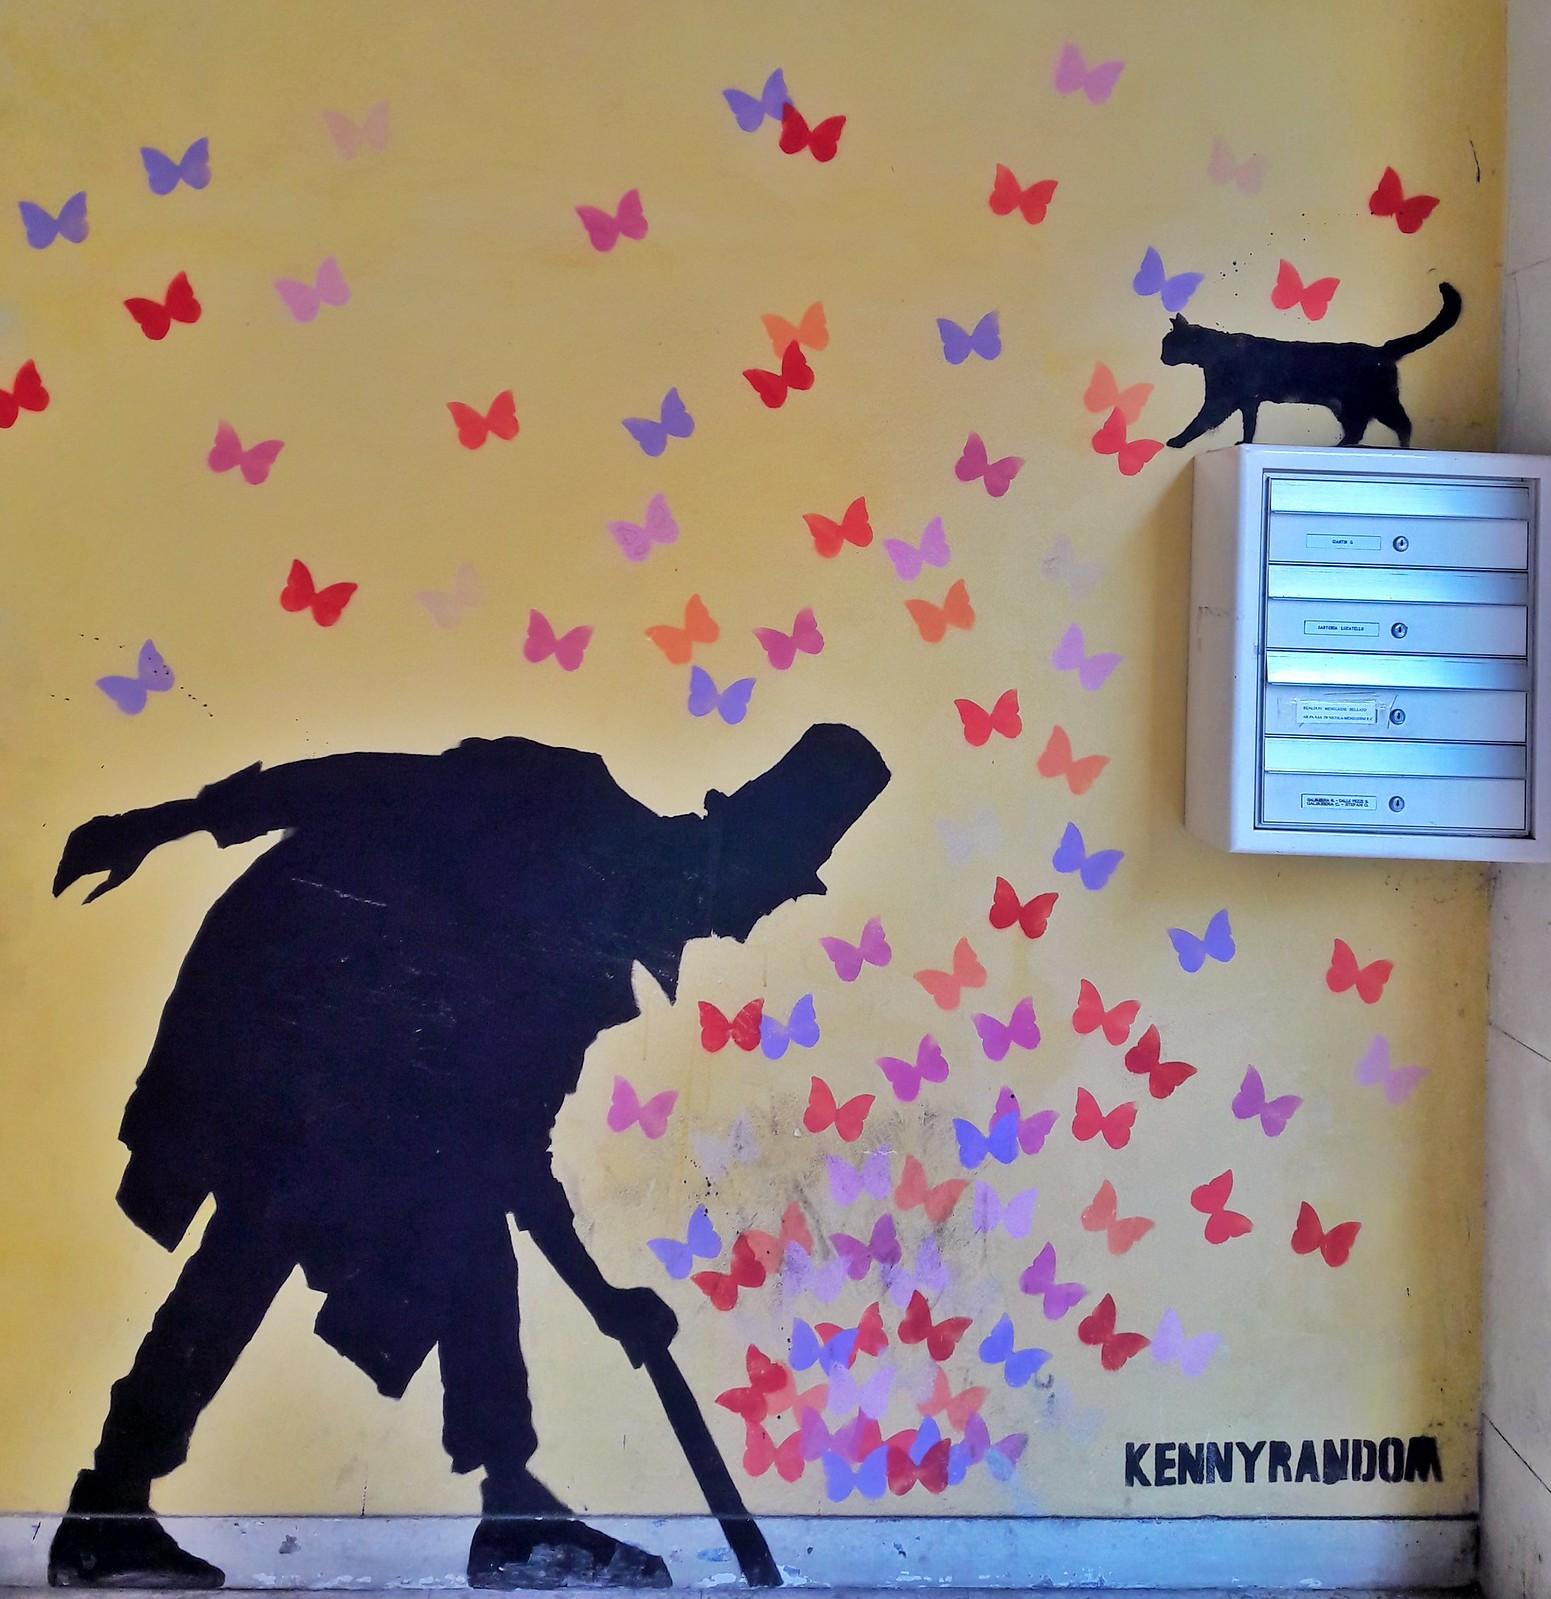 murales kenny random padova